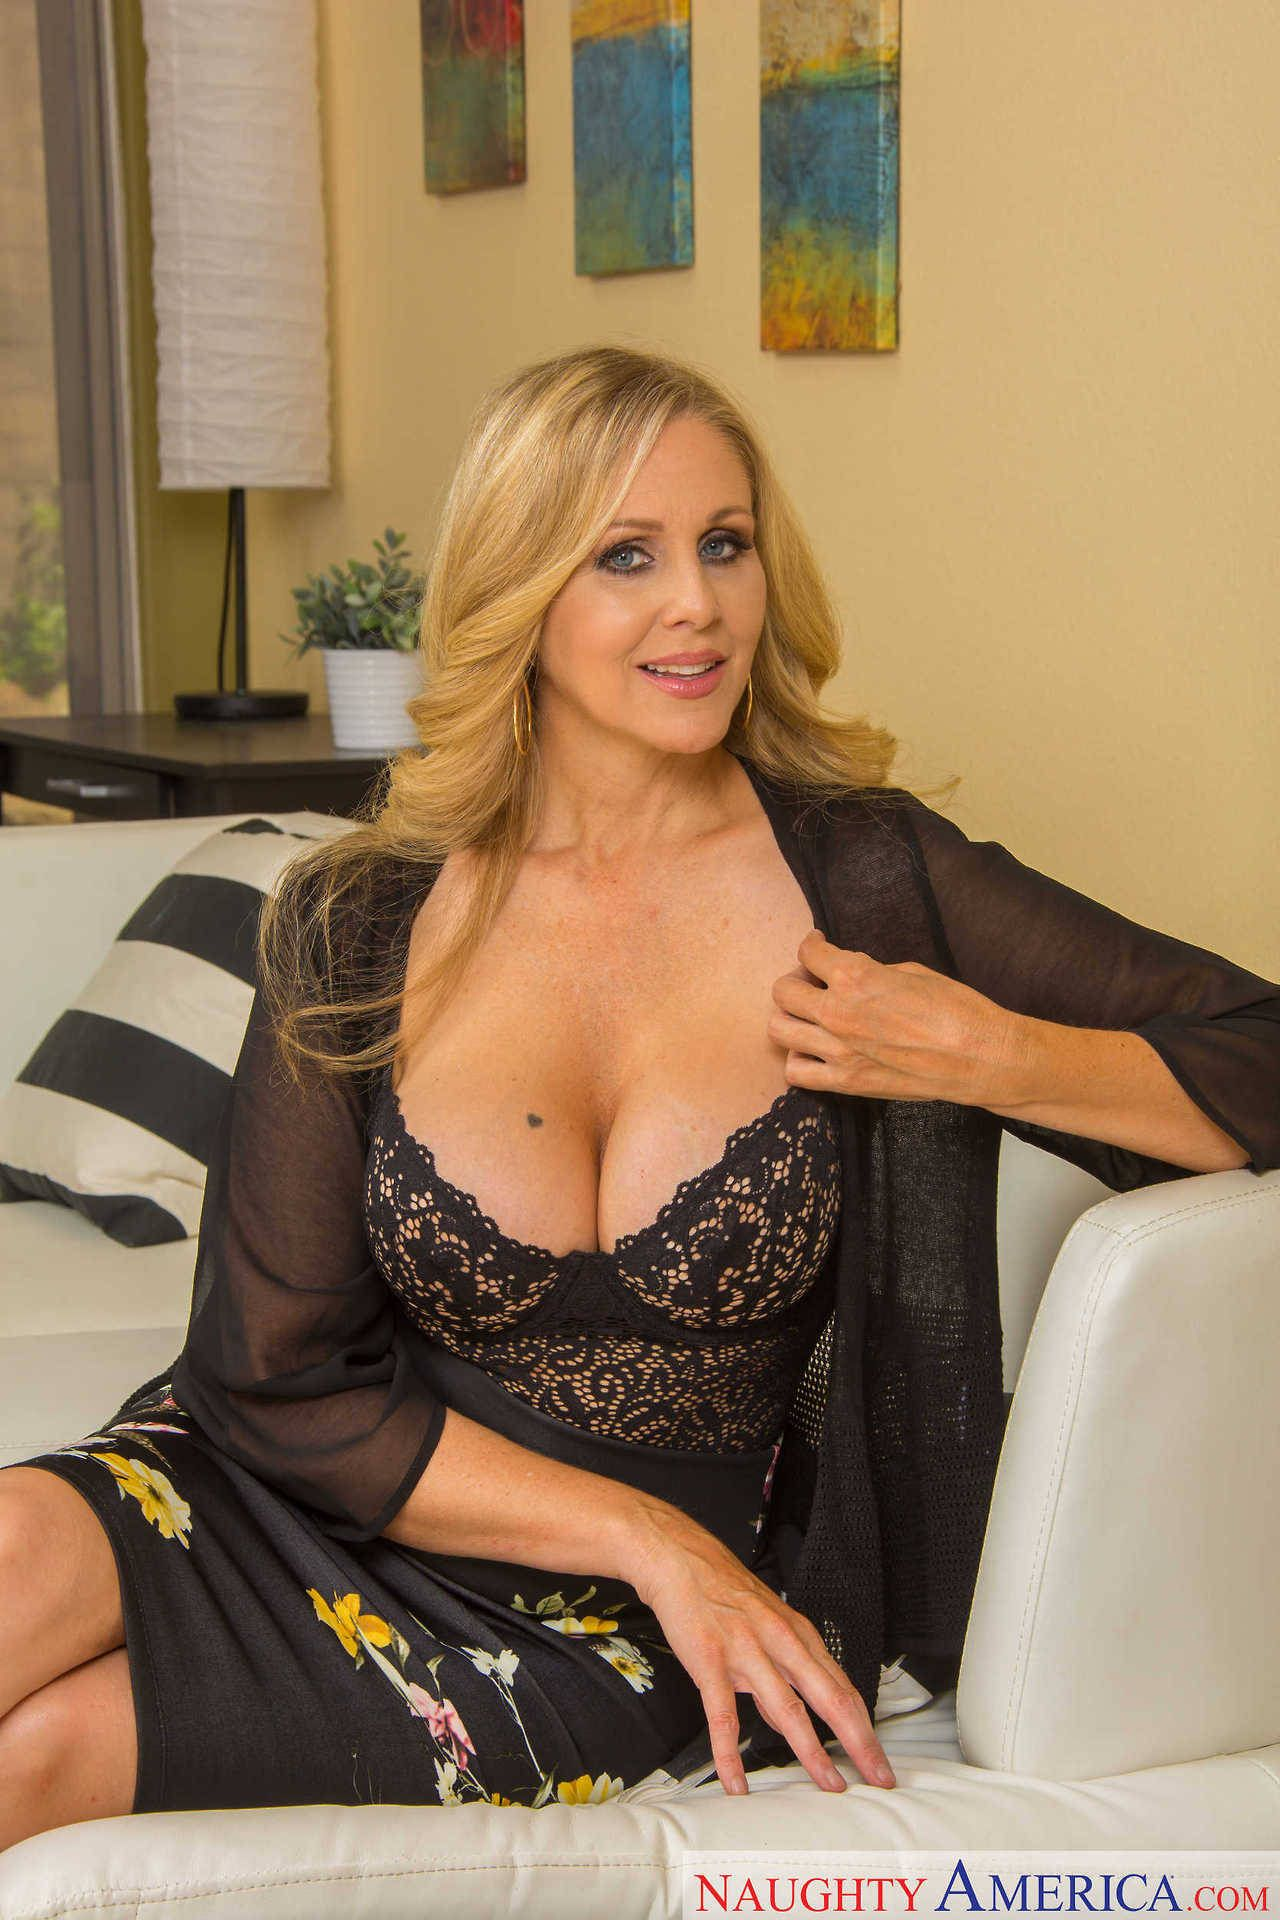 beautiful babes universe — oileduppornstars: mature porn mommy julia